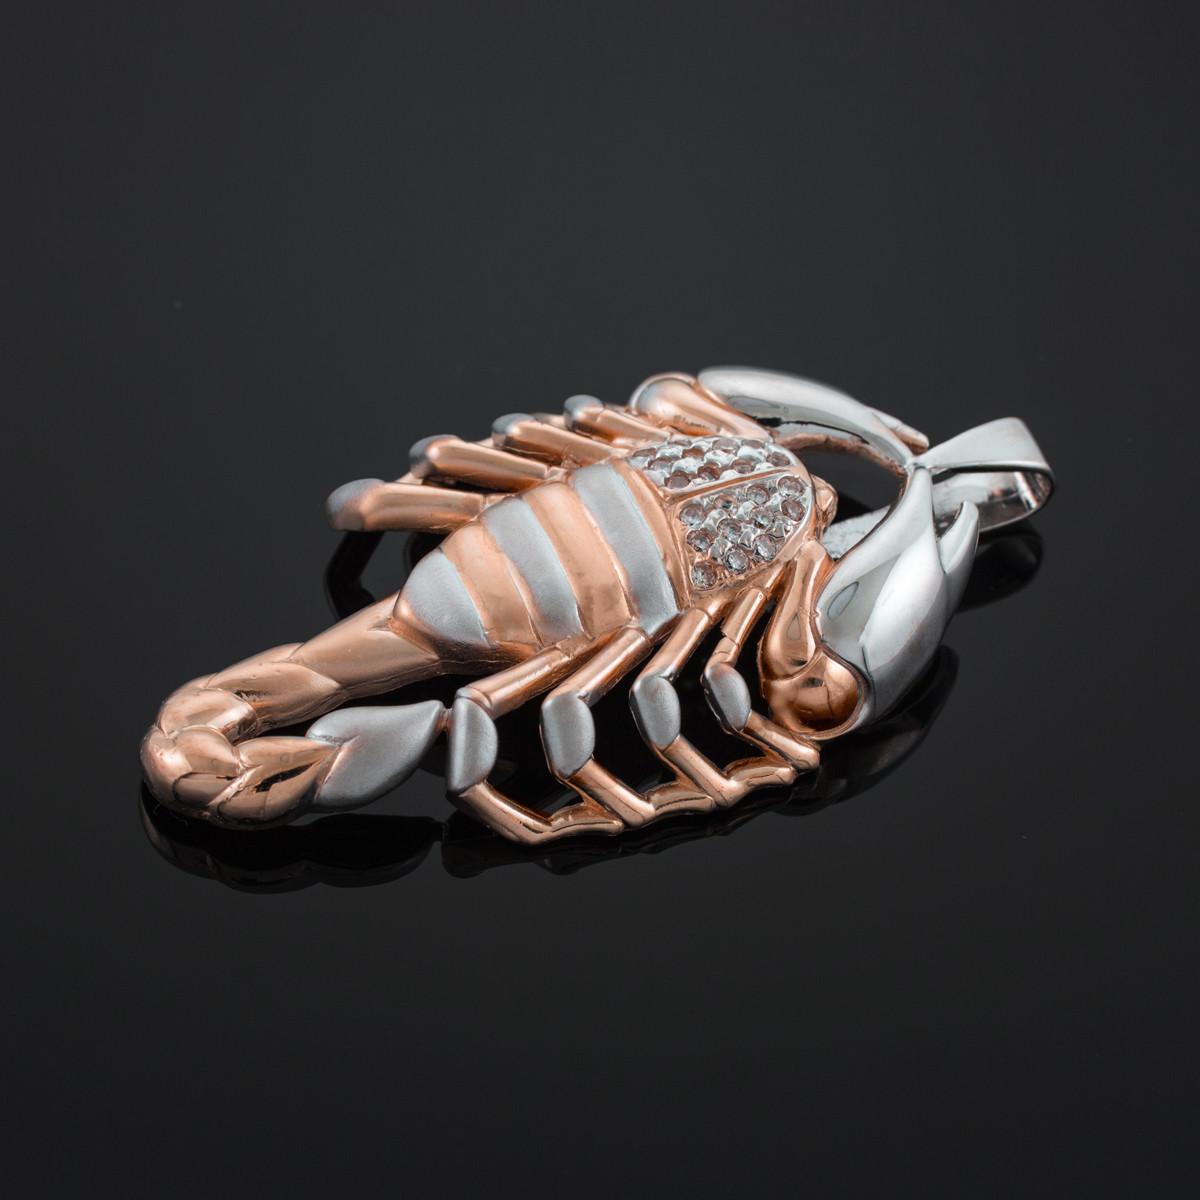 14k Two Tone Gold Scorpion Pendant